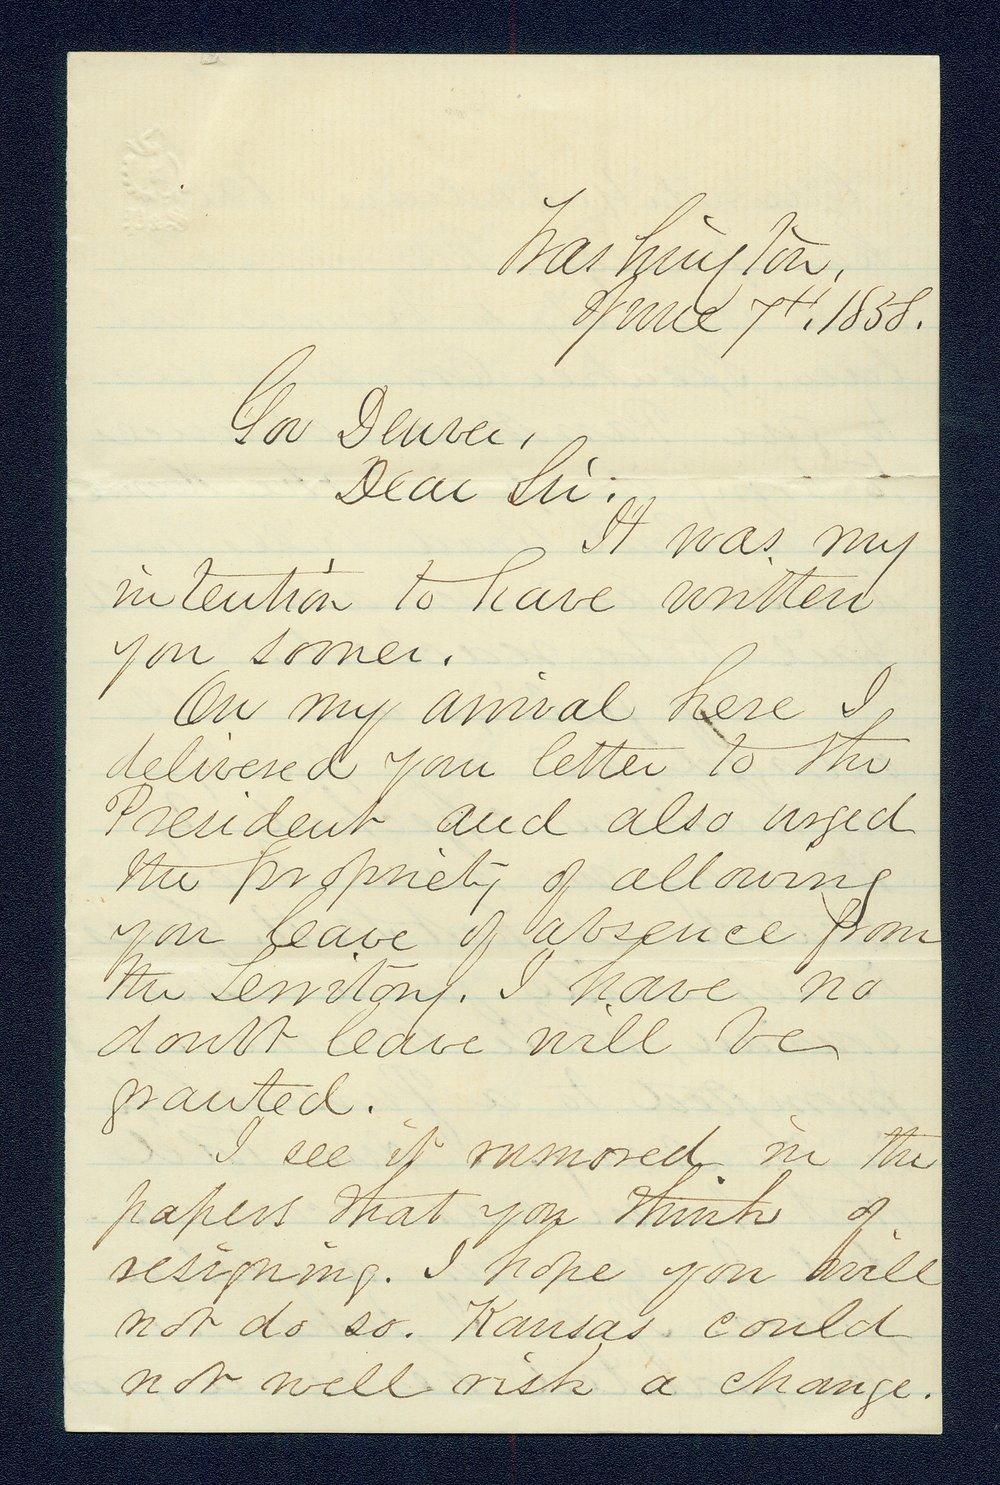 George A. Crawford to General James William Denver - 1